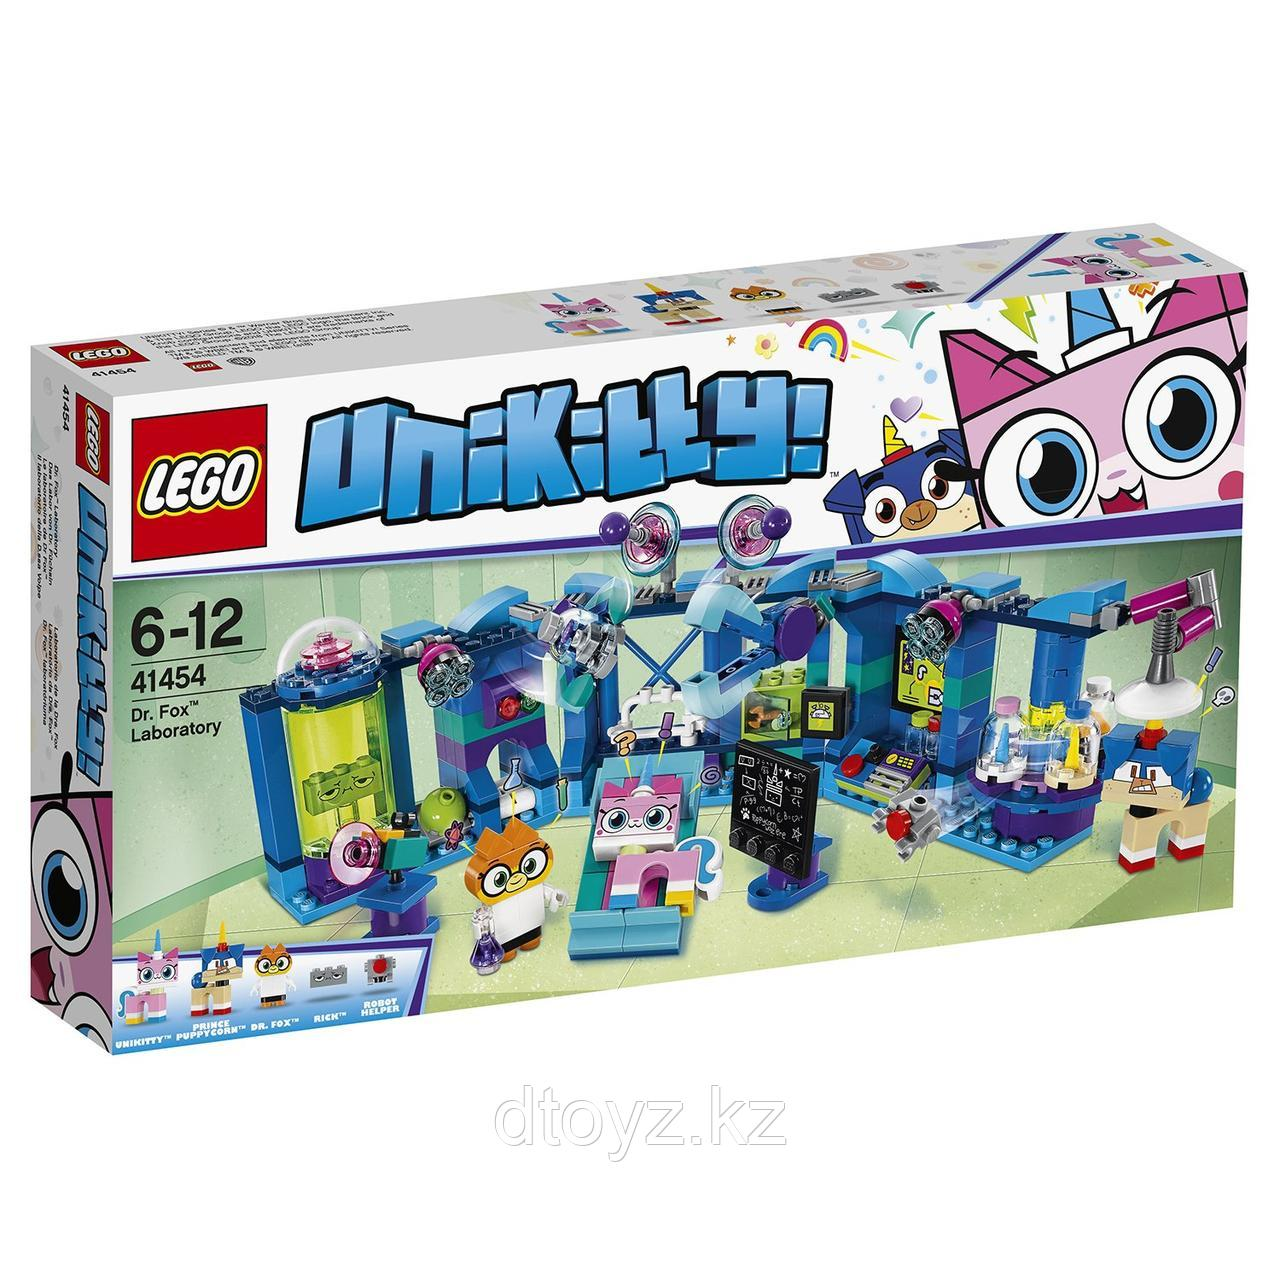 Lego Unikitty 41454 Лаборатория доктора Фокса